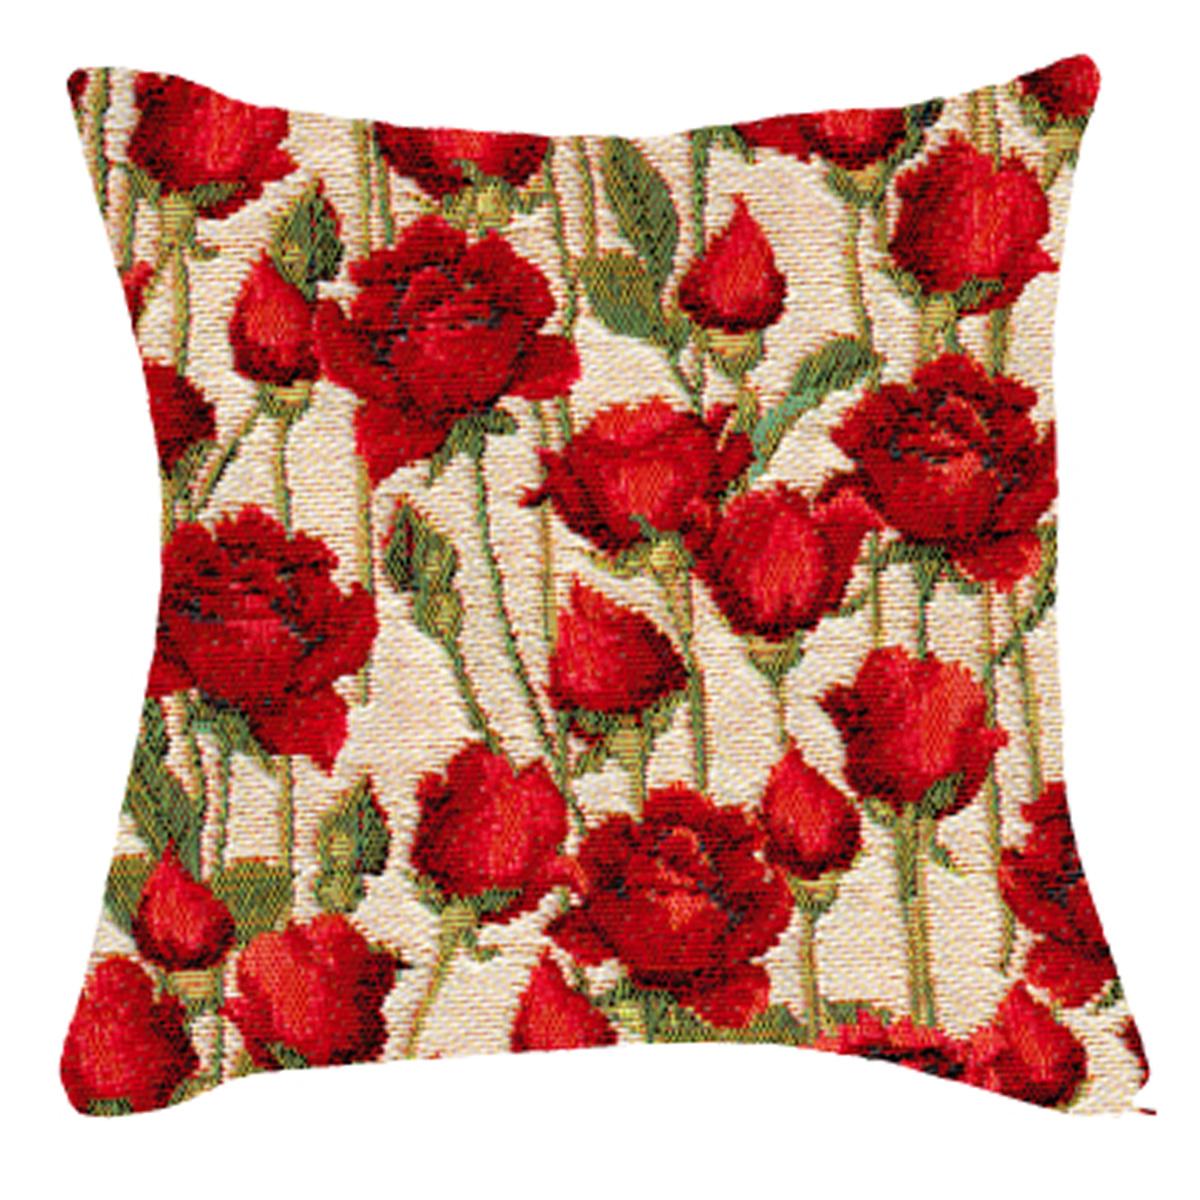 Coussin artisanal \'Royal Tapisserie\' blanc rouge (roses rouges)  - 45x45 cm - [Q6355]